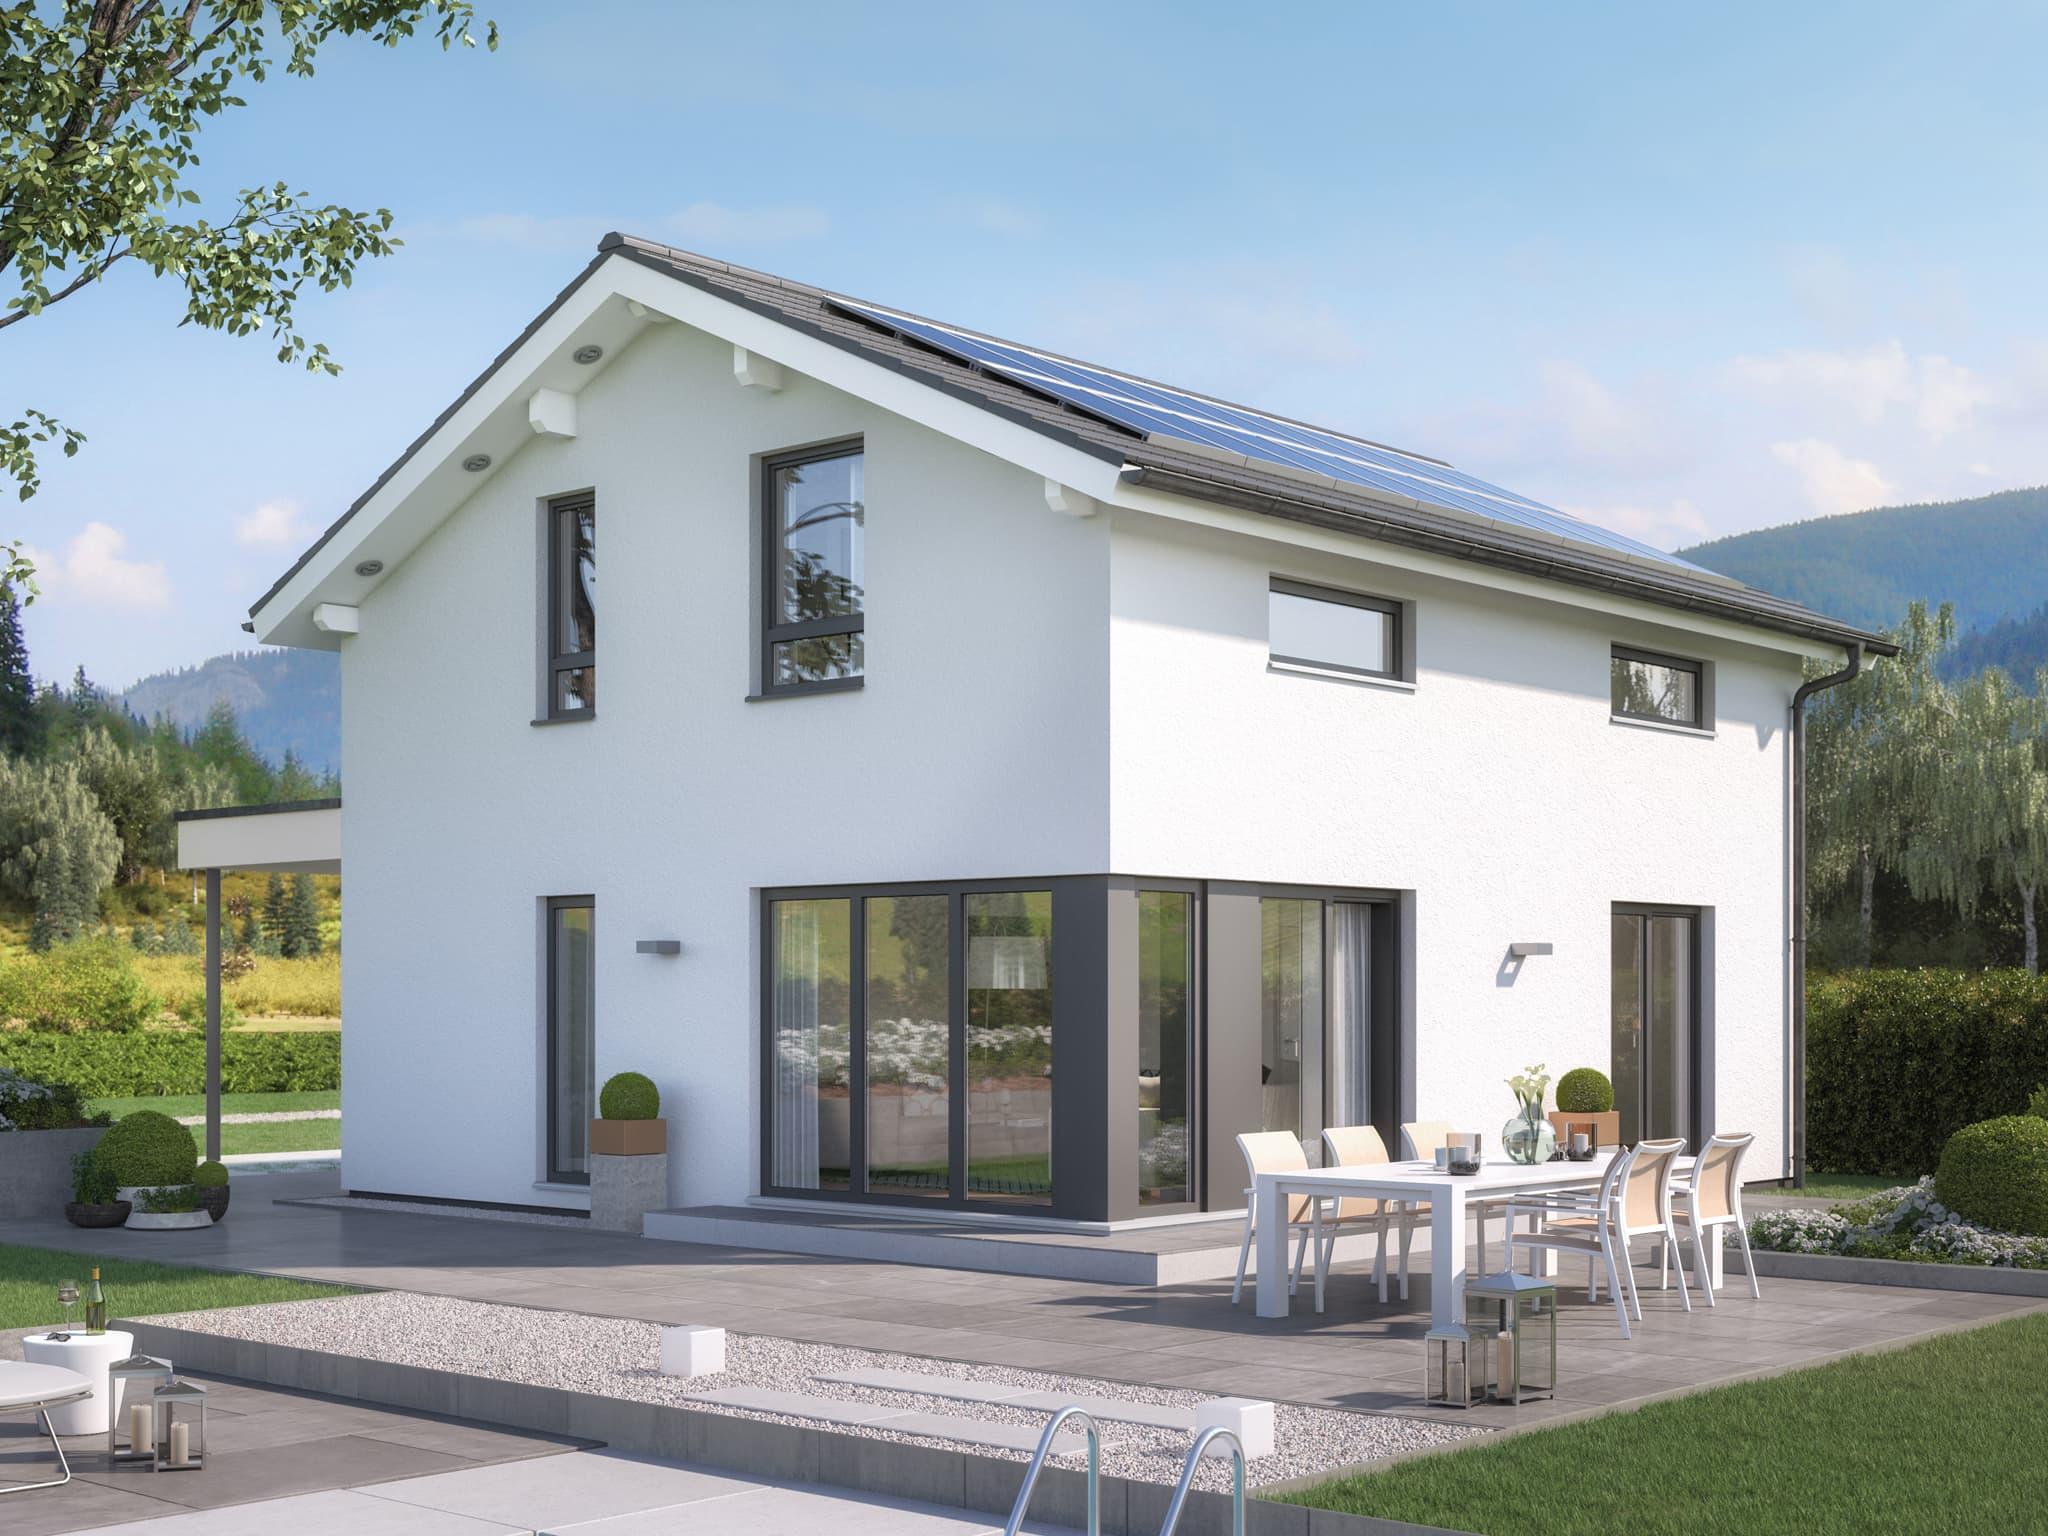 Modernes Satteldach Haus mit Putz Fassade, 4 Zimmer Grundriss, 125 qm - Einfamilienhaus bauen Ideen Bien Zenker Fertighaus EDITION 125 V4 - HausbauDirekt.de